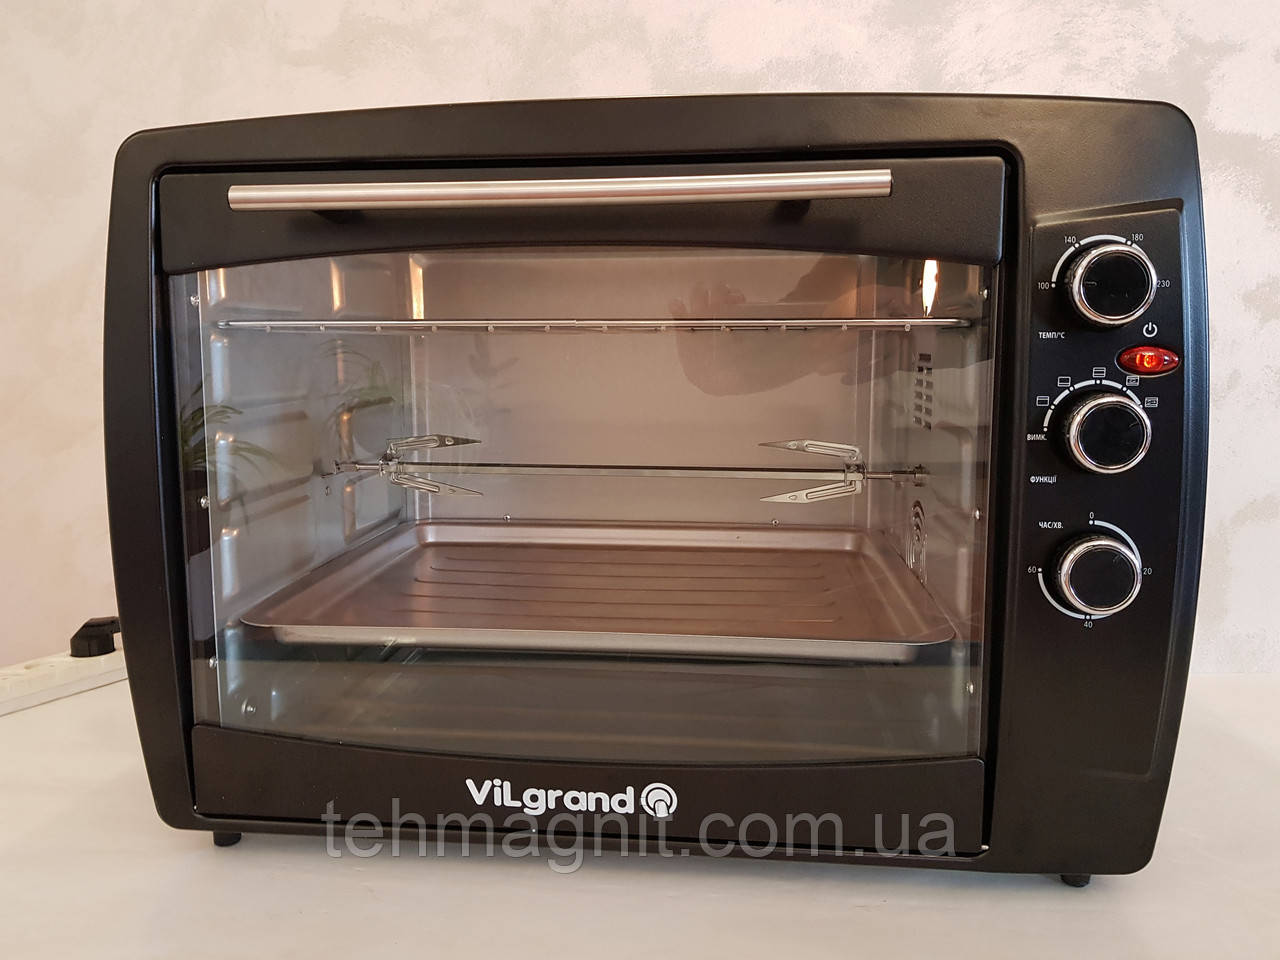 Електрична піч ViLgrand VEO650-18 з конвекцією Black 65 L 2200W